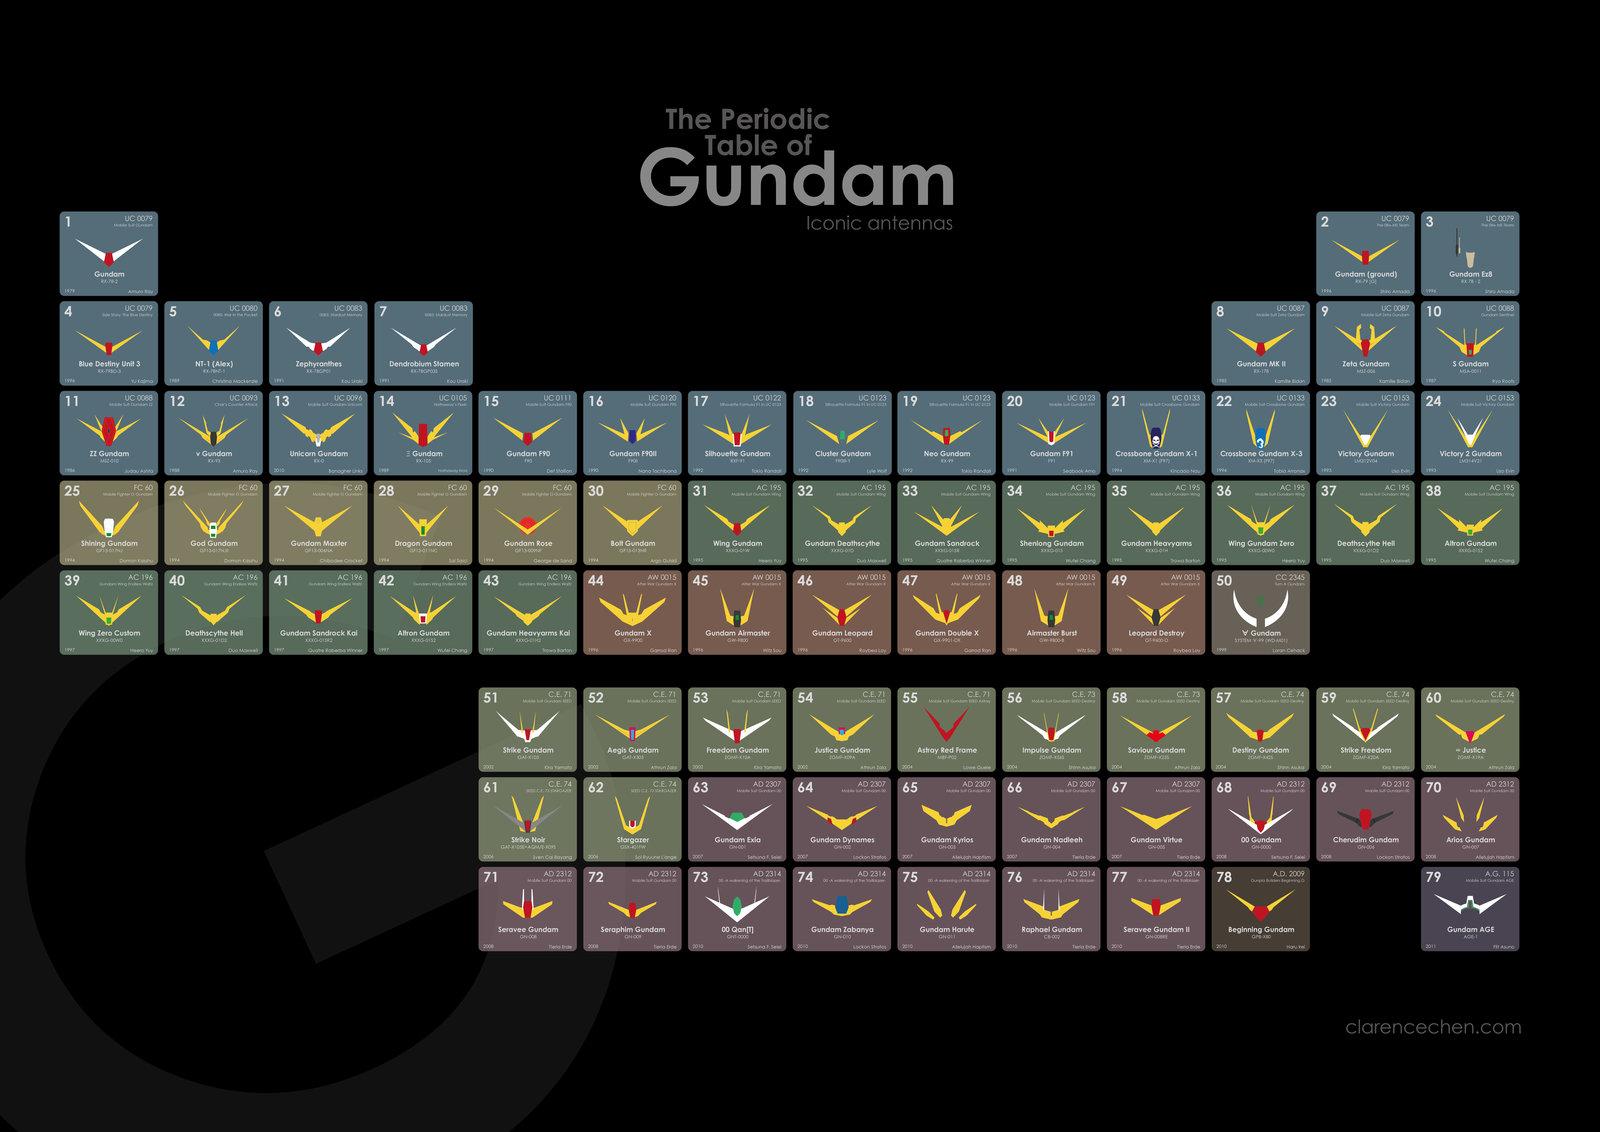 the periodic table of gundamjpg - Periodic Table Jpg